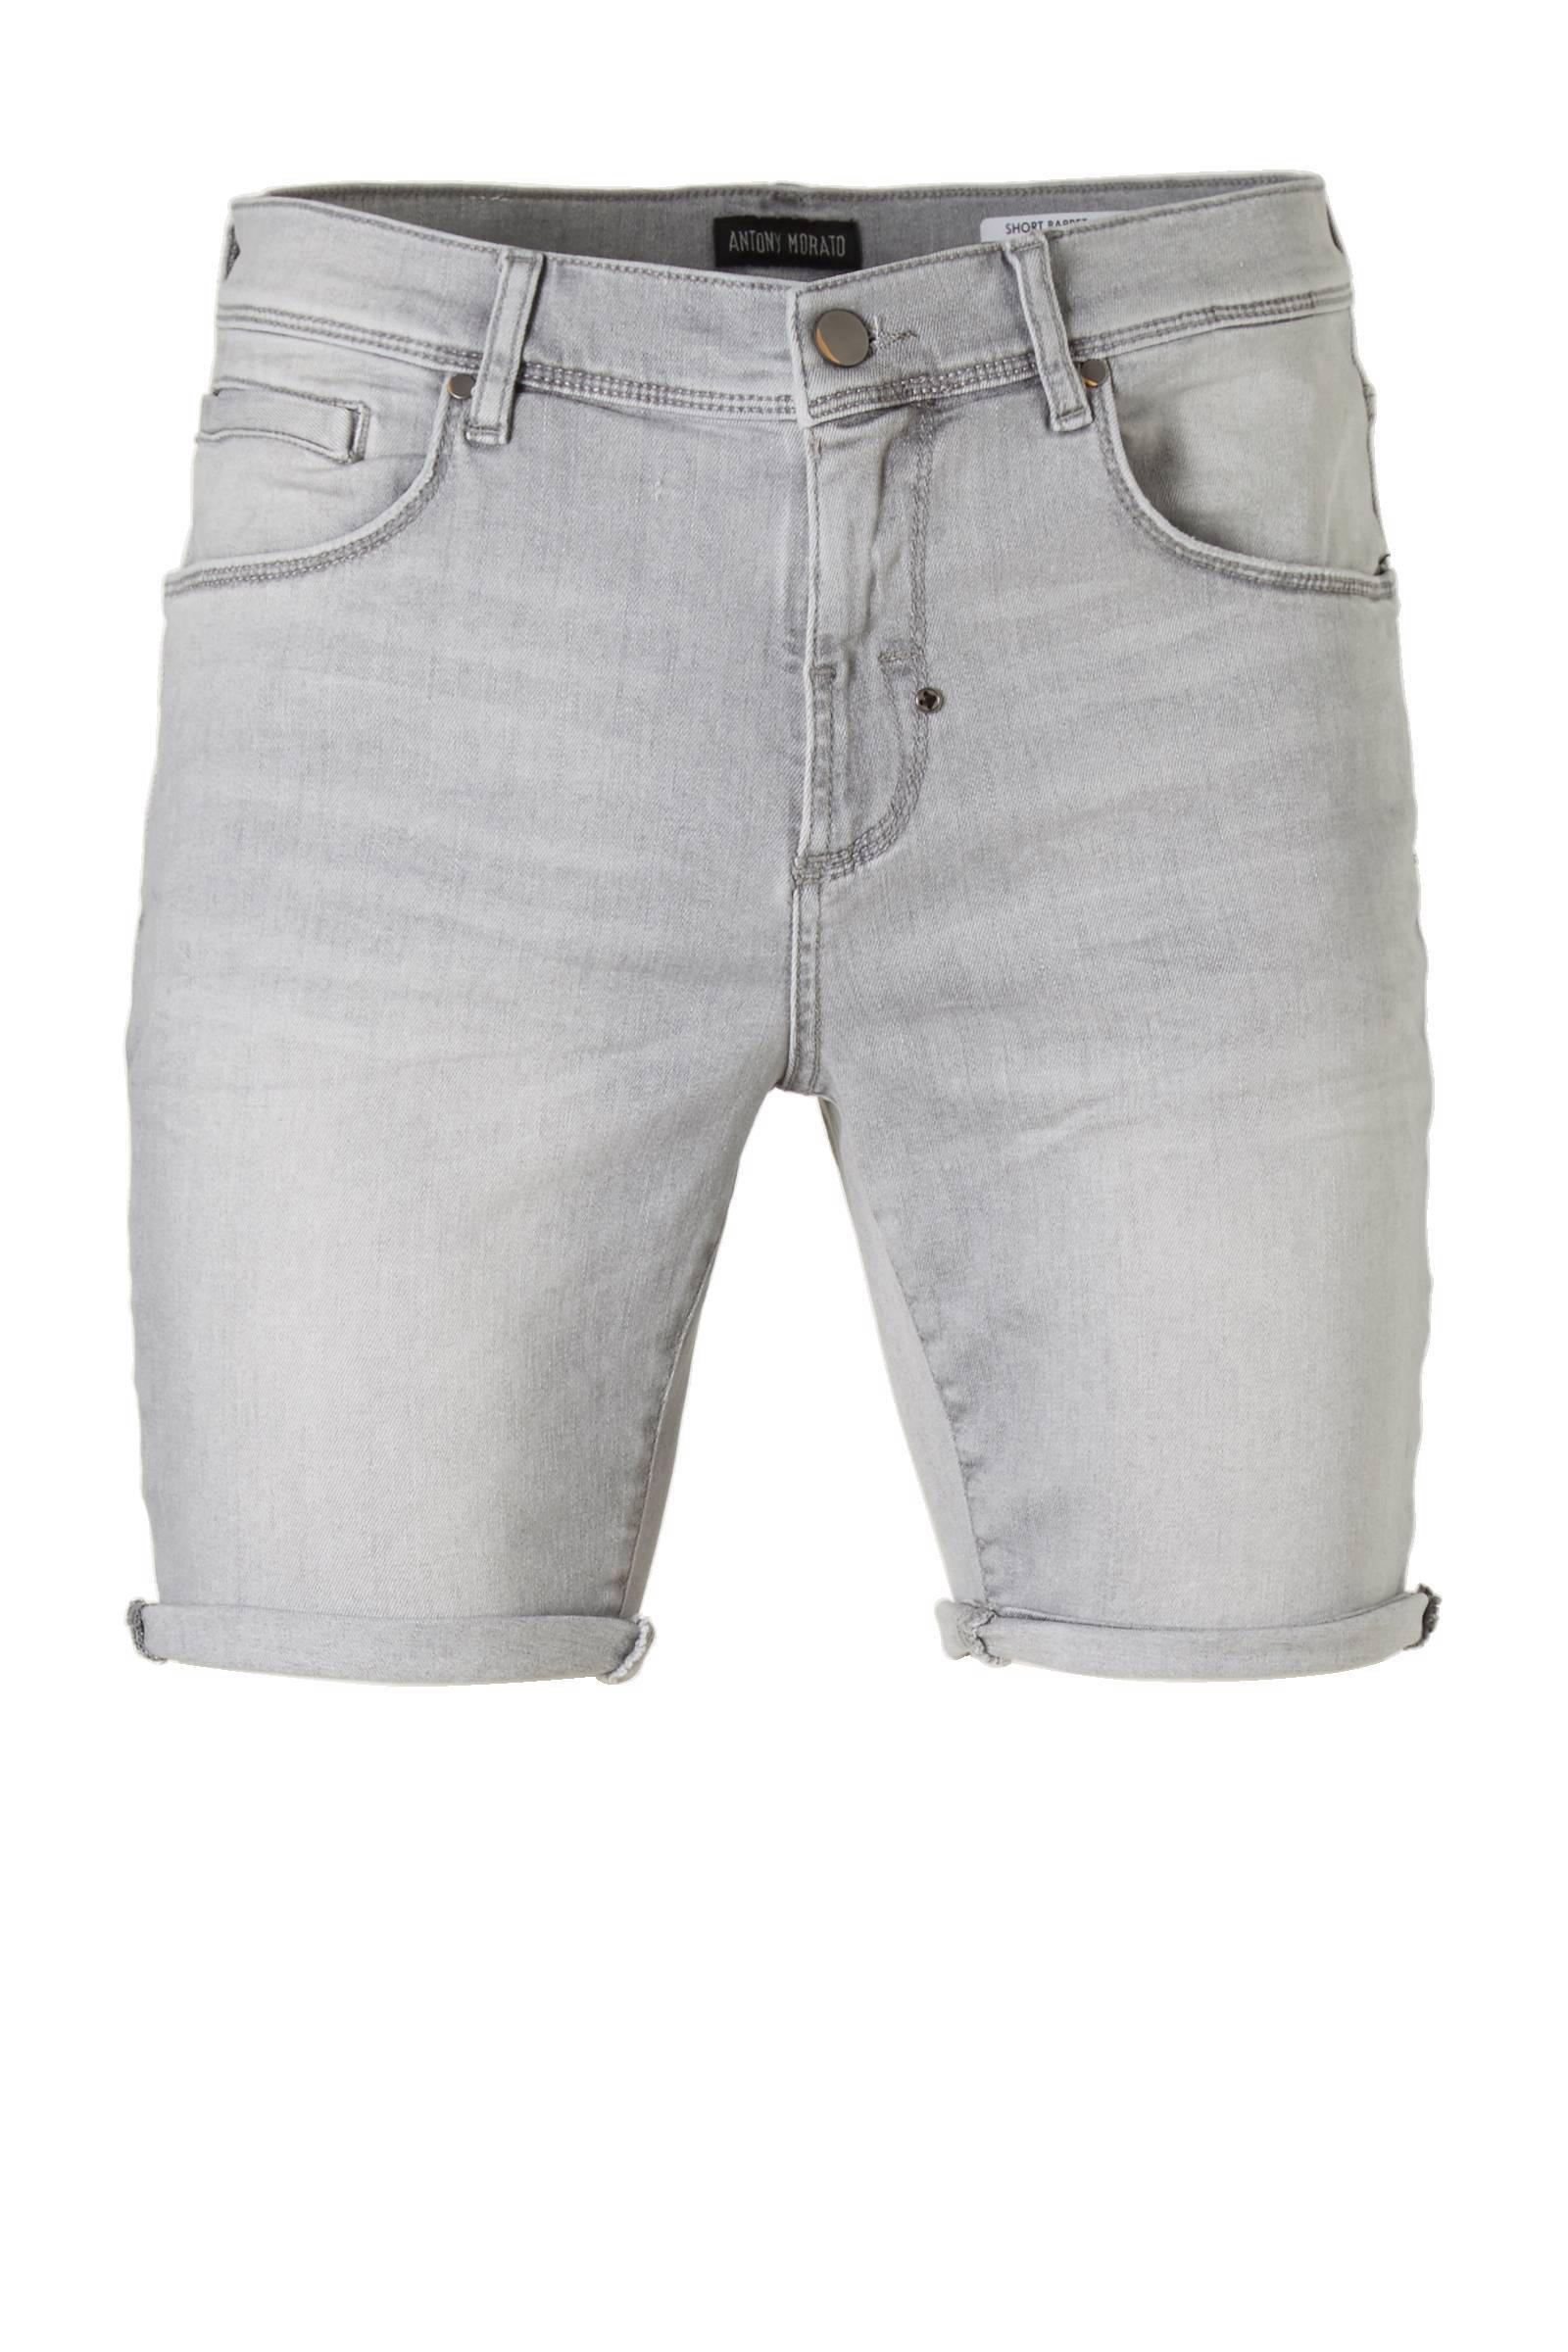 Antony Morato skinny jeans short Barret | wehkamp